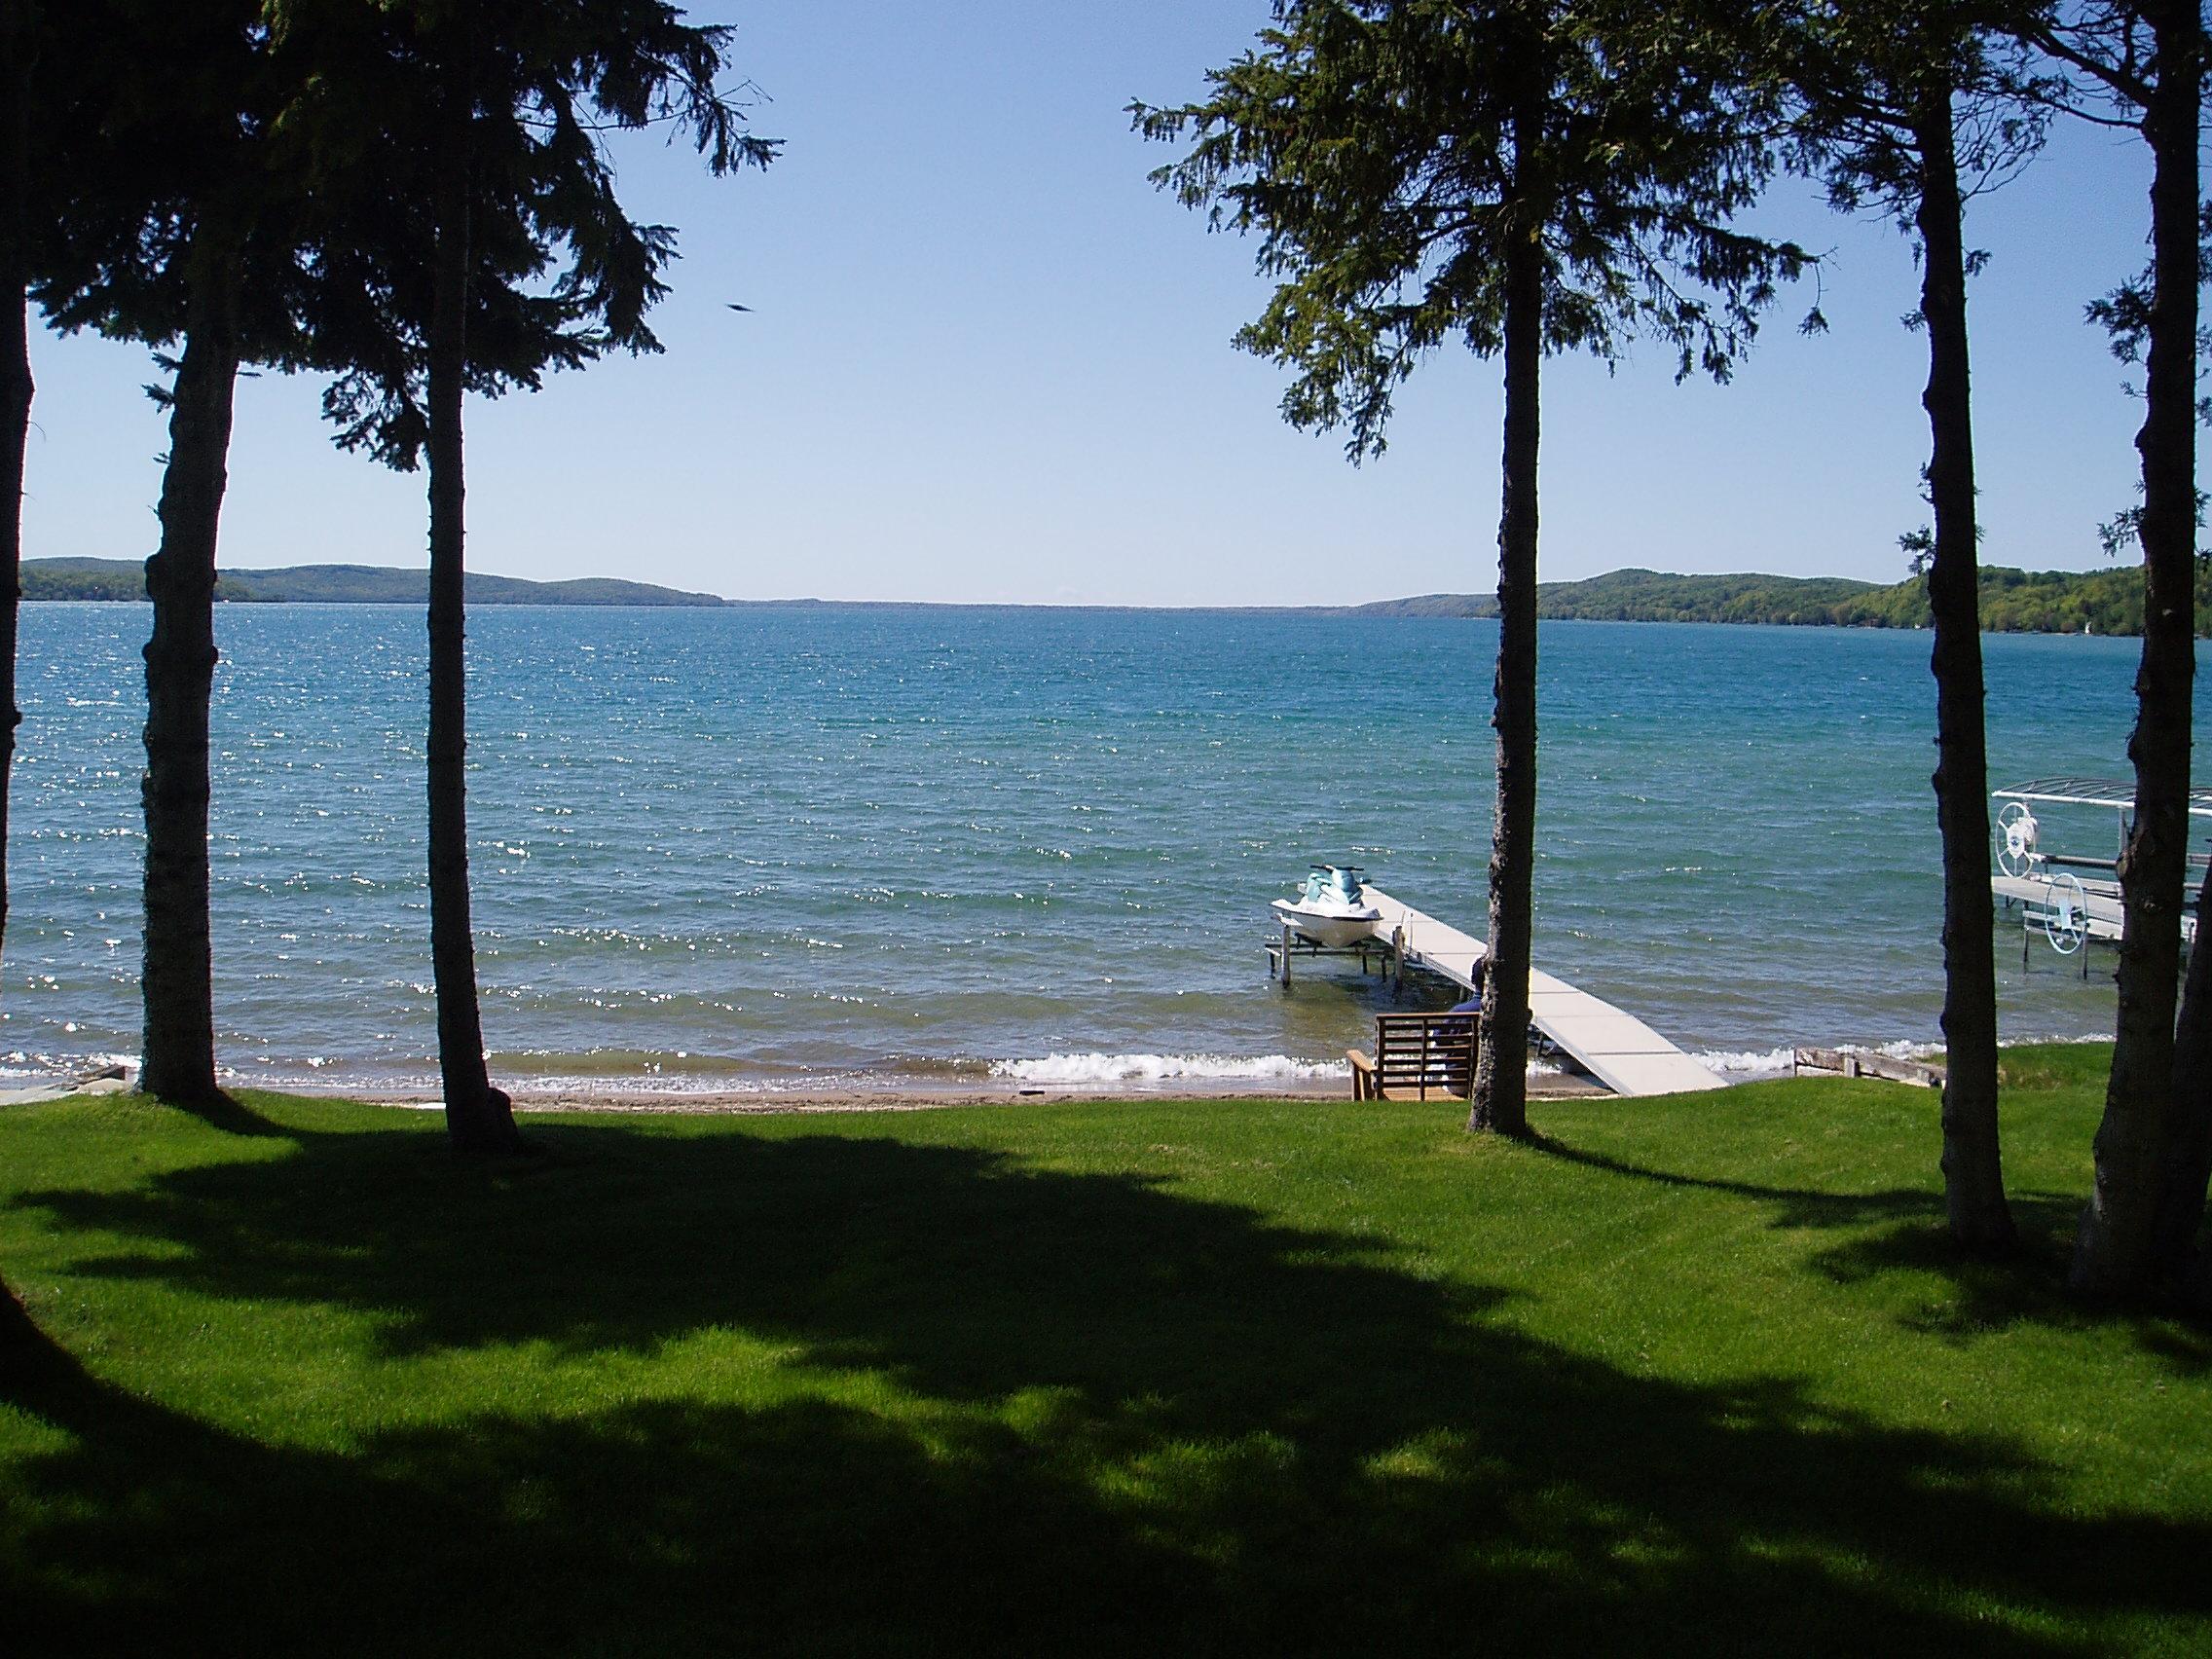 Michigan benzie county benzonia - Michigan S Crystal Lake Jpg Location Benzie County